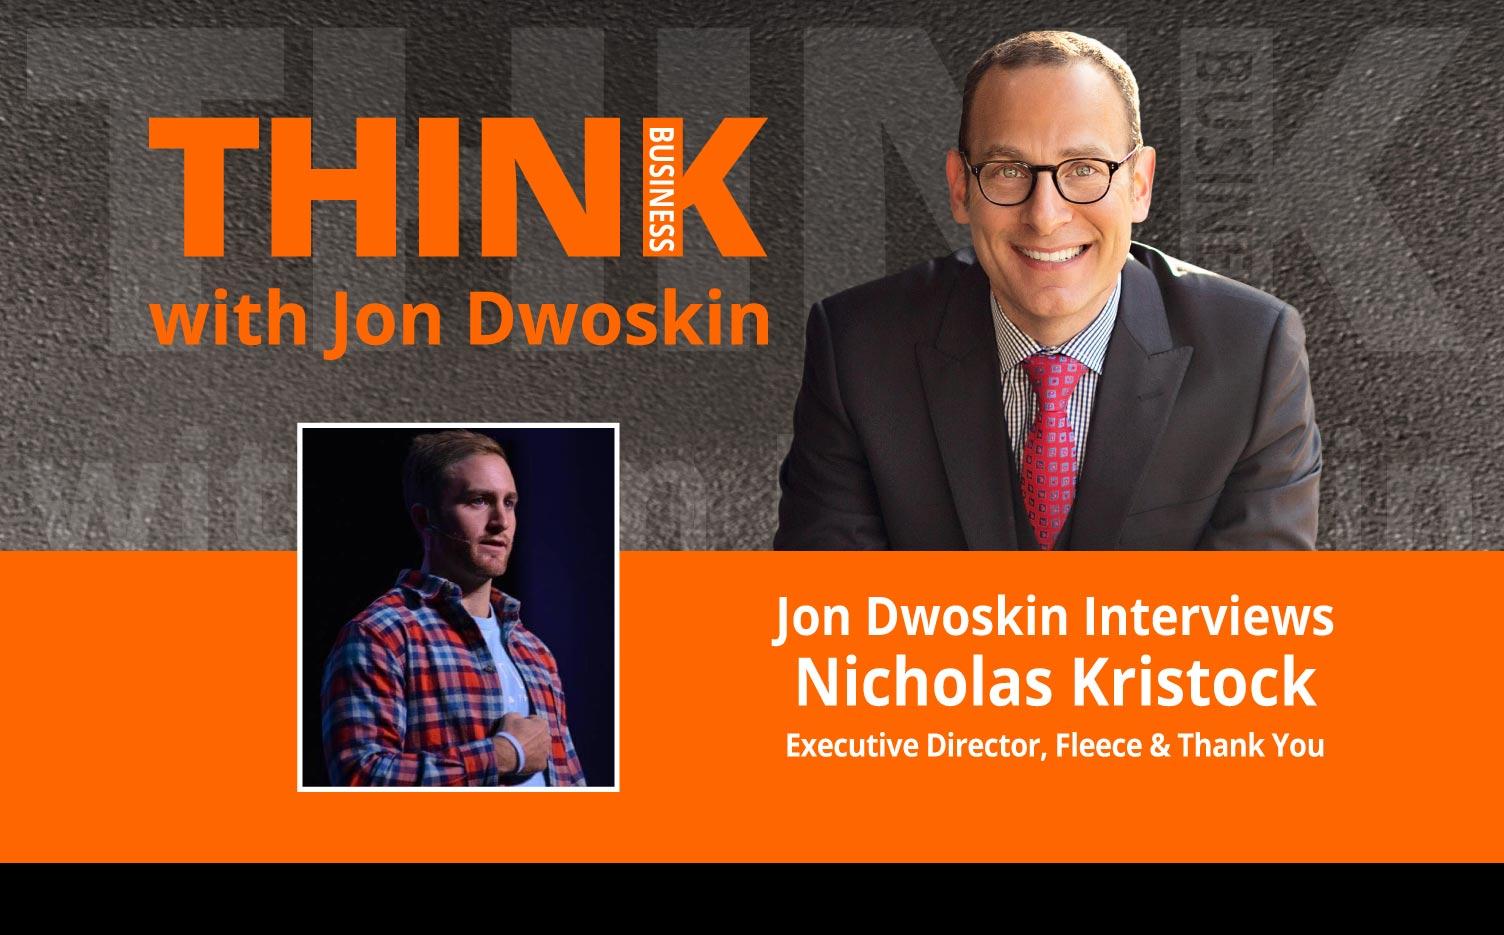 THINK Business-Podcast-Jon Dwoskin interviews Nicholas-Kristock